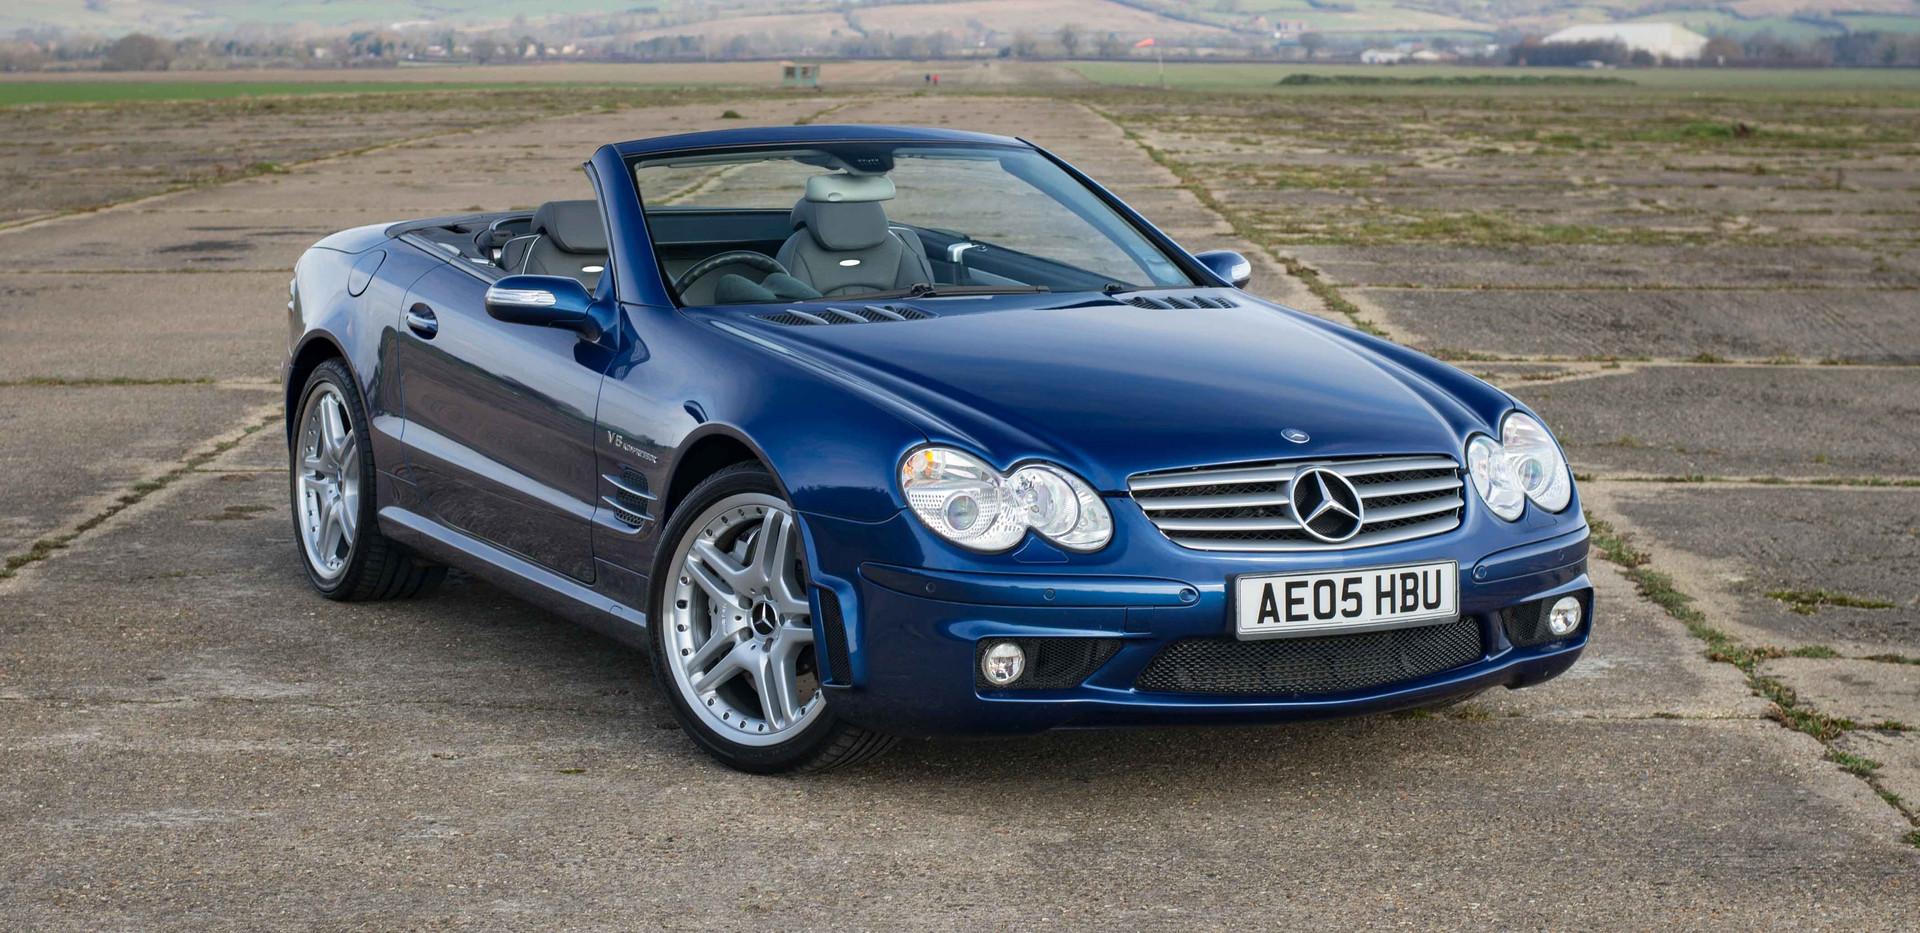 SL55 For Sale UK London  (3 of 36).jpg